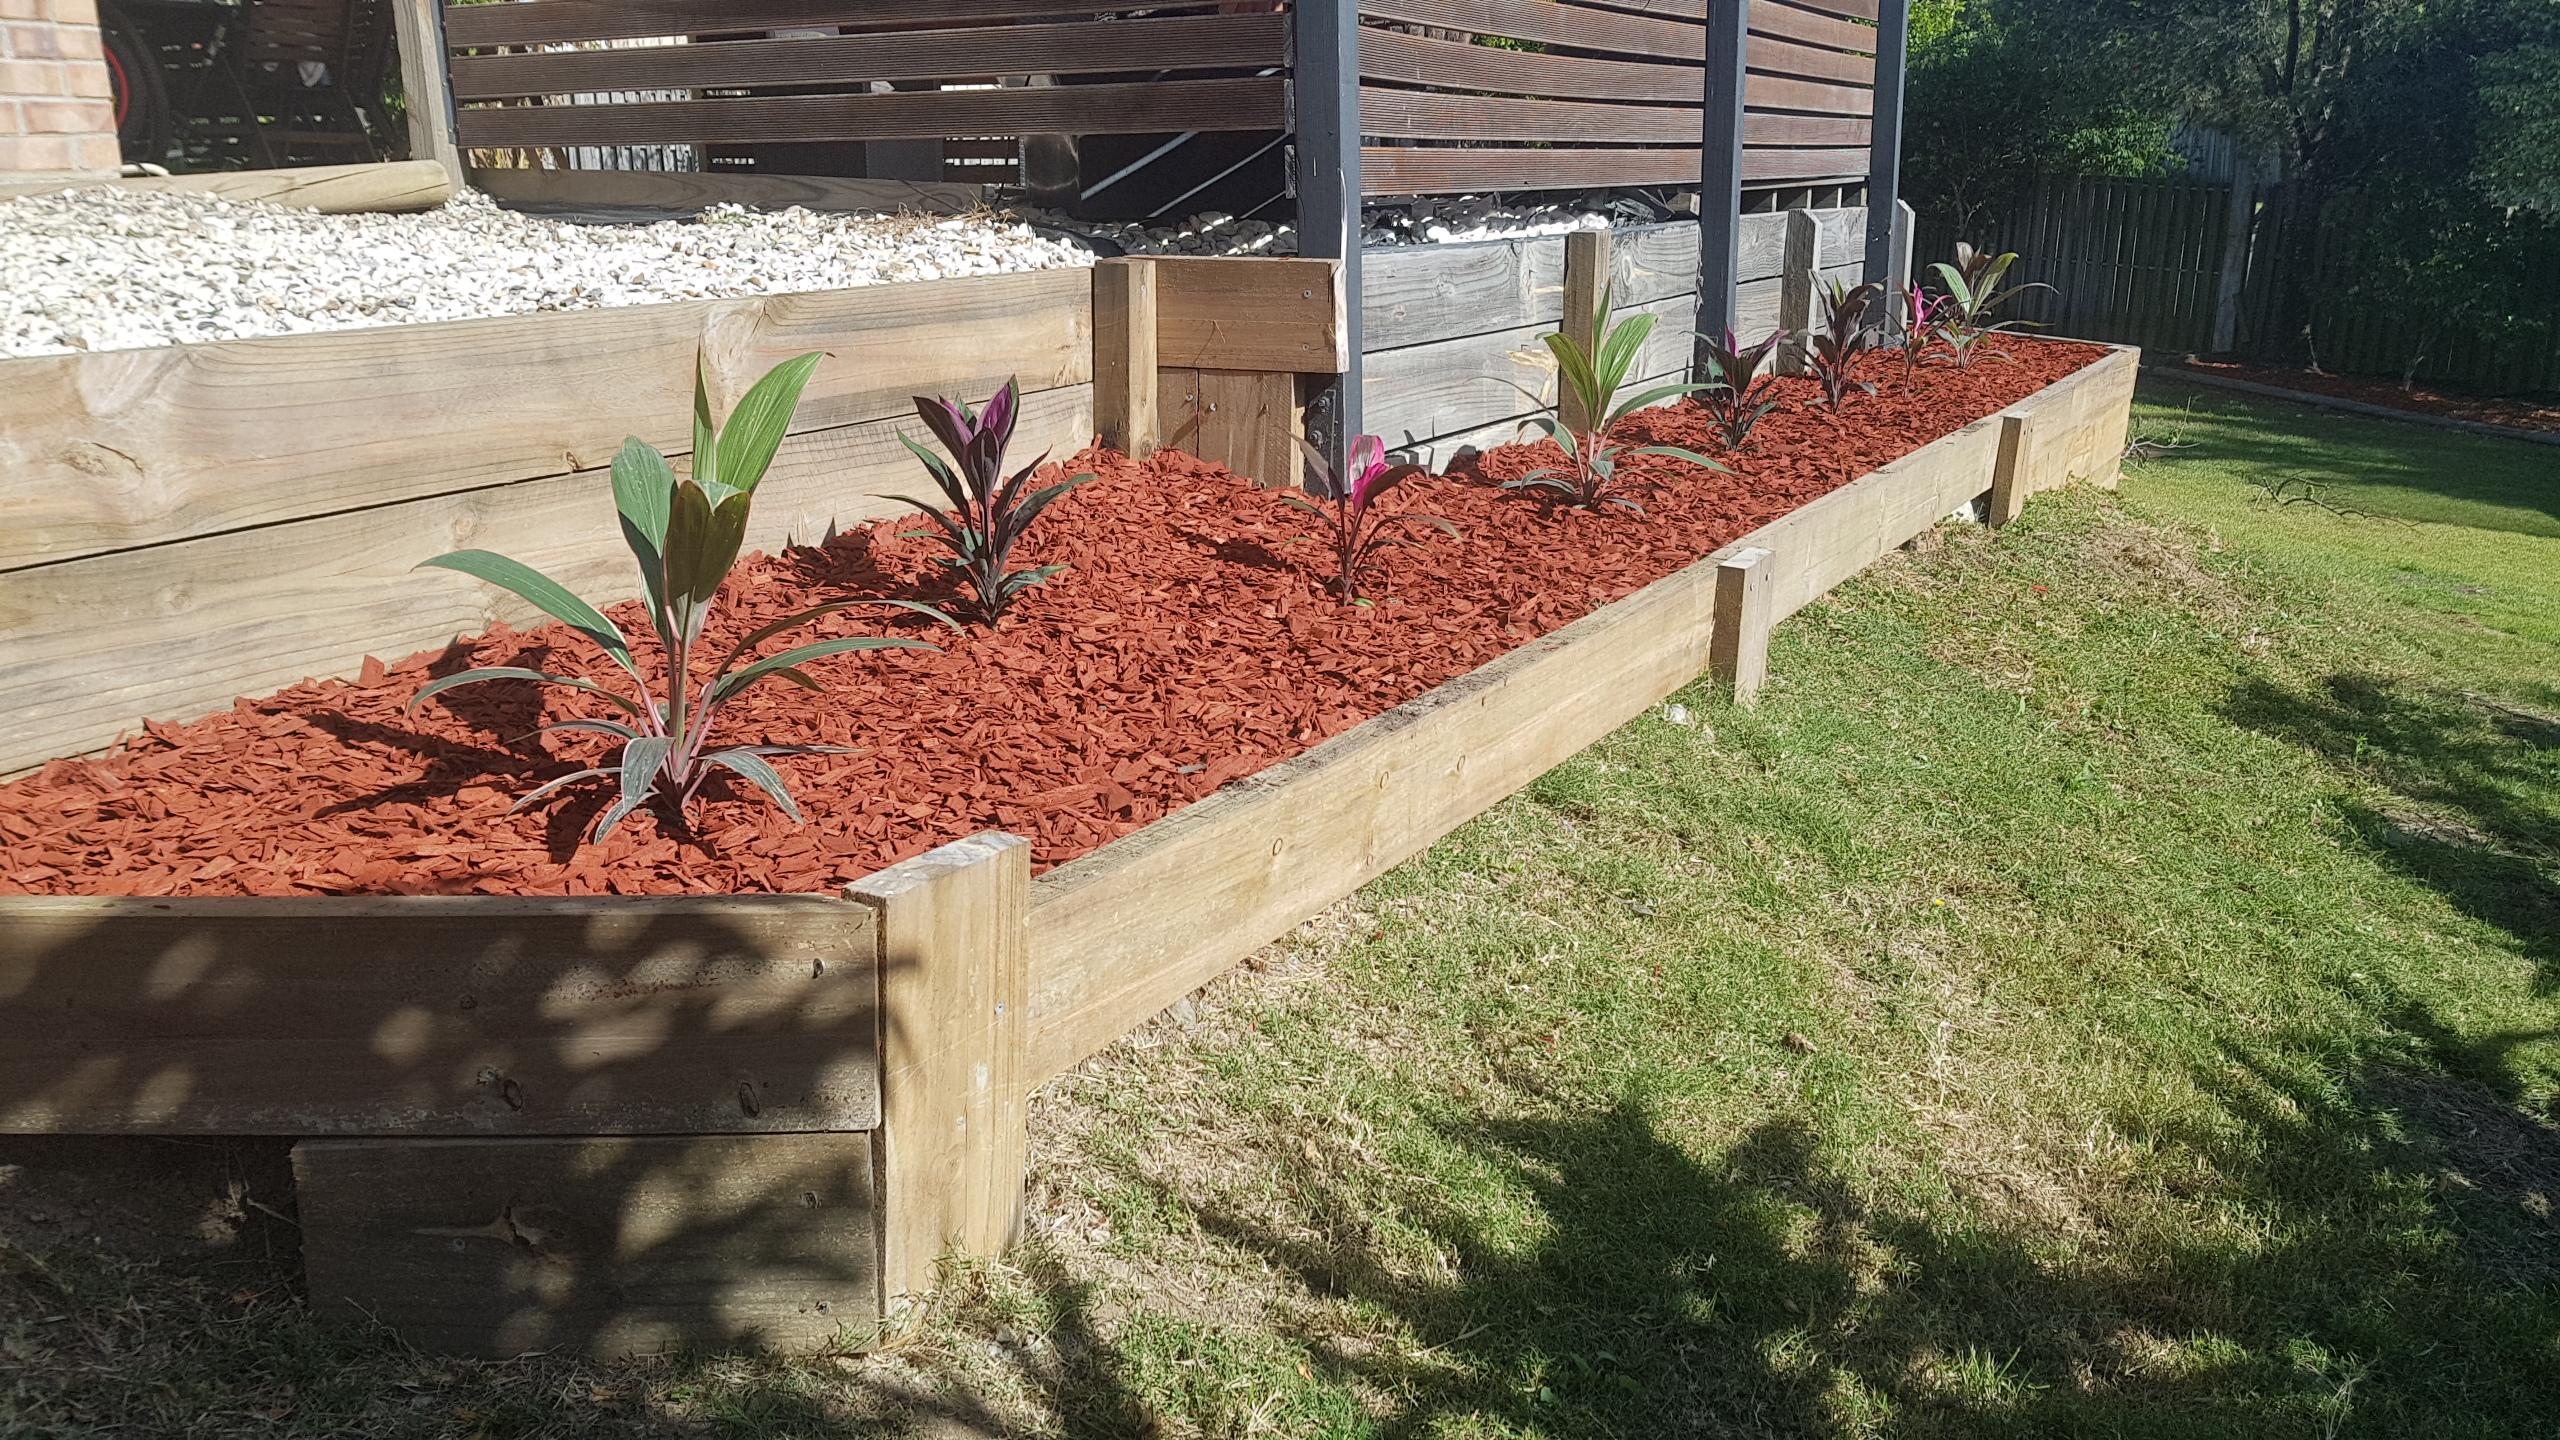 Brads Lifestyle Landscaping - Pimpama, QLD 4209 - 0421 933 851   ShowMeLocal.com